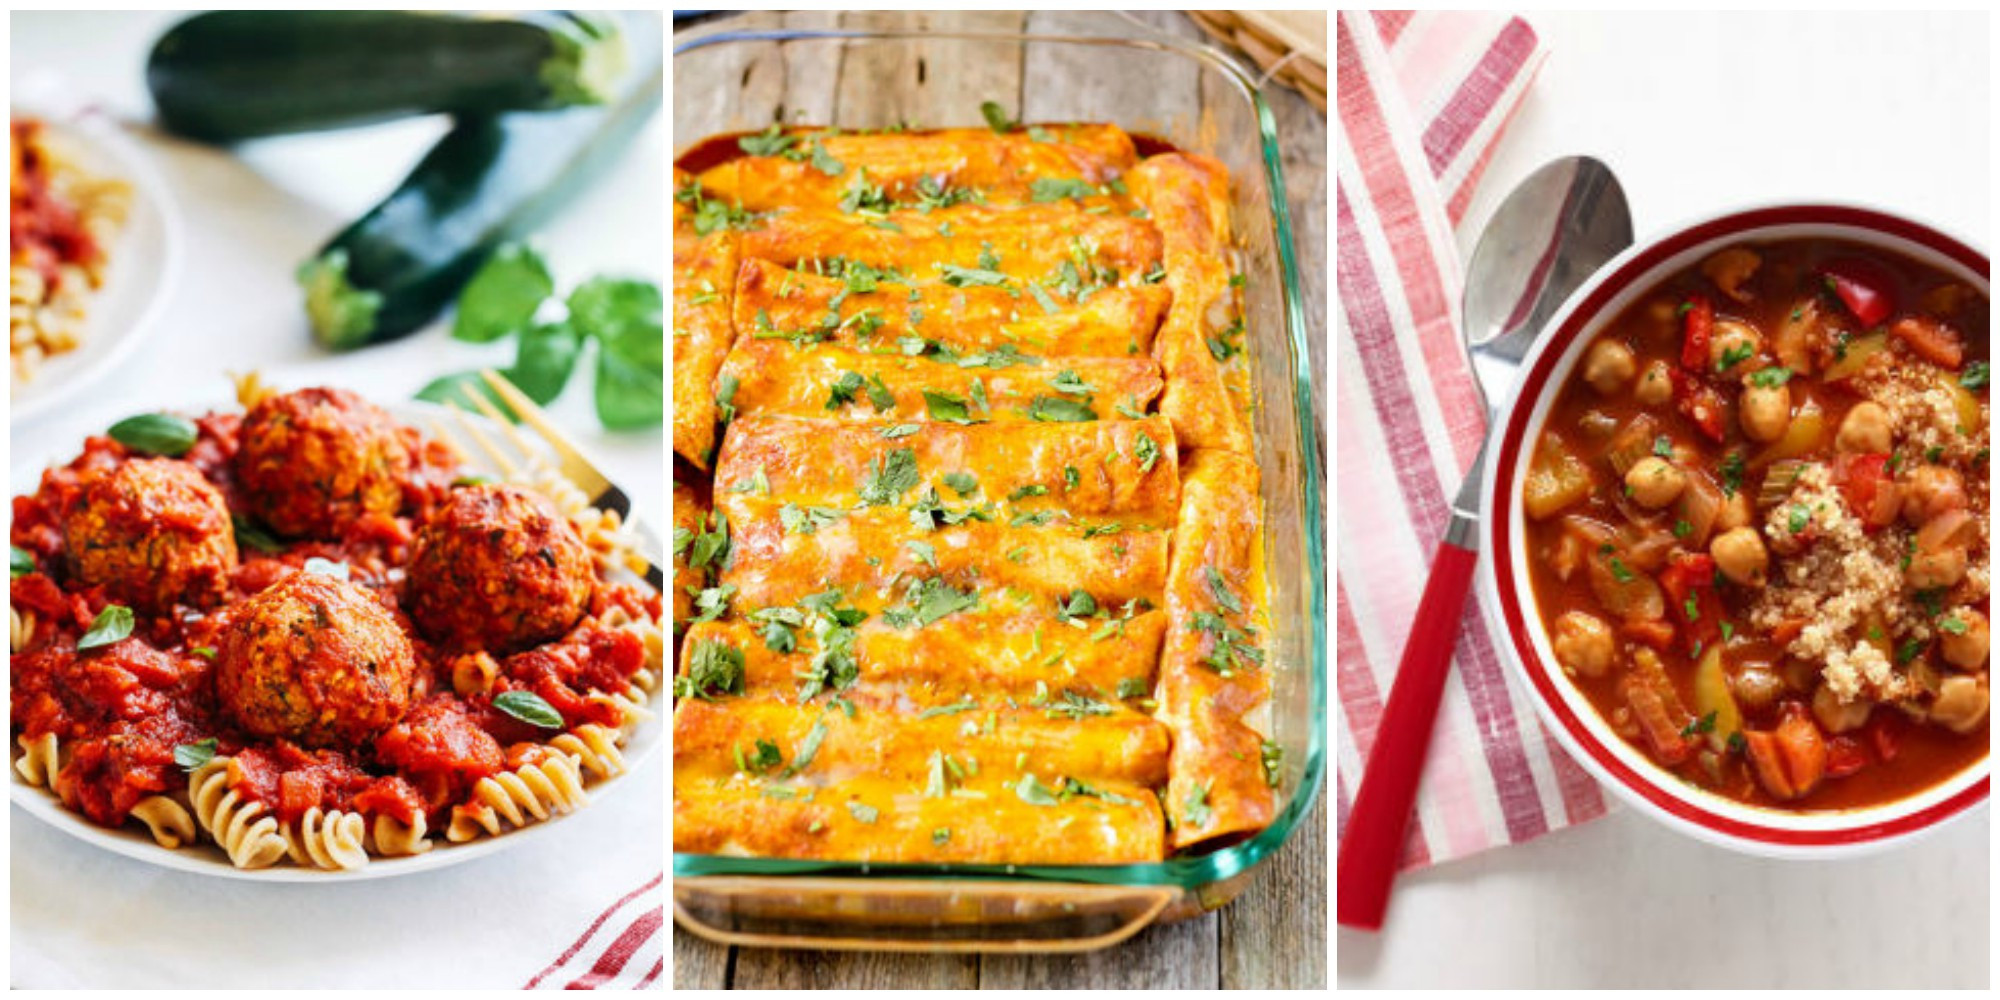 Easy Vegan Recipes  10 Easy Vegan Dinner Recipes Best Vegan Meal Ideas